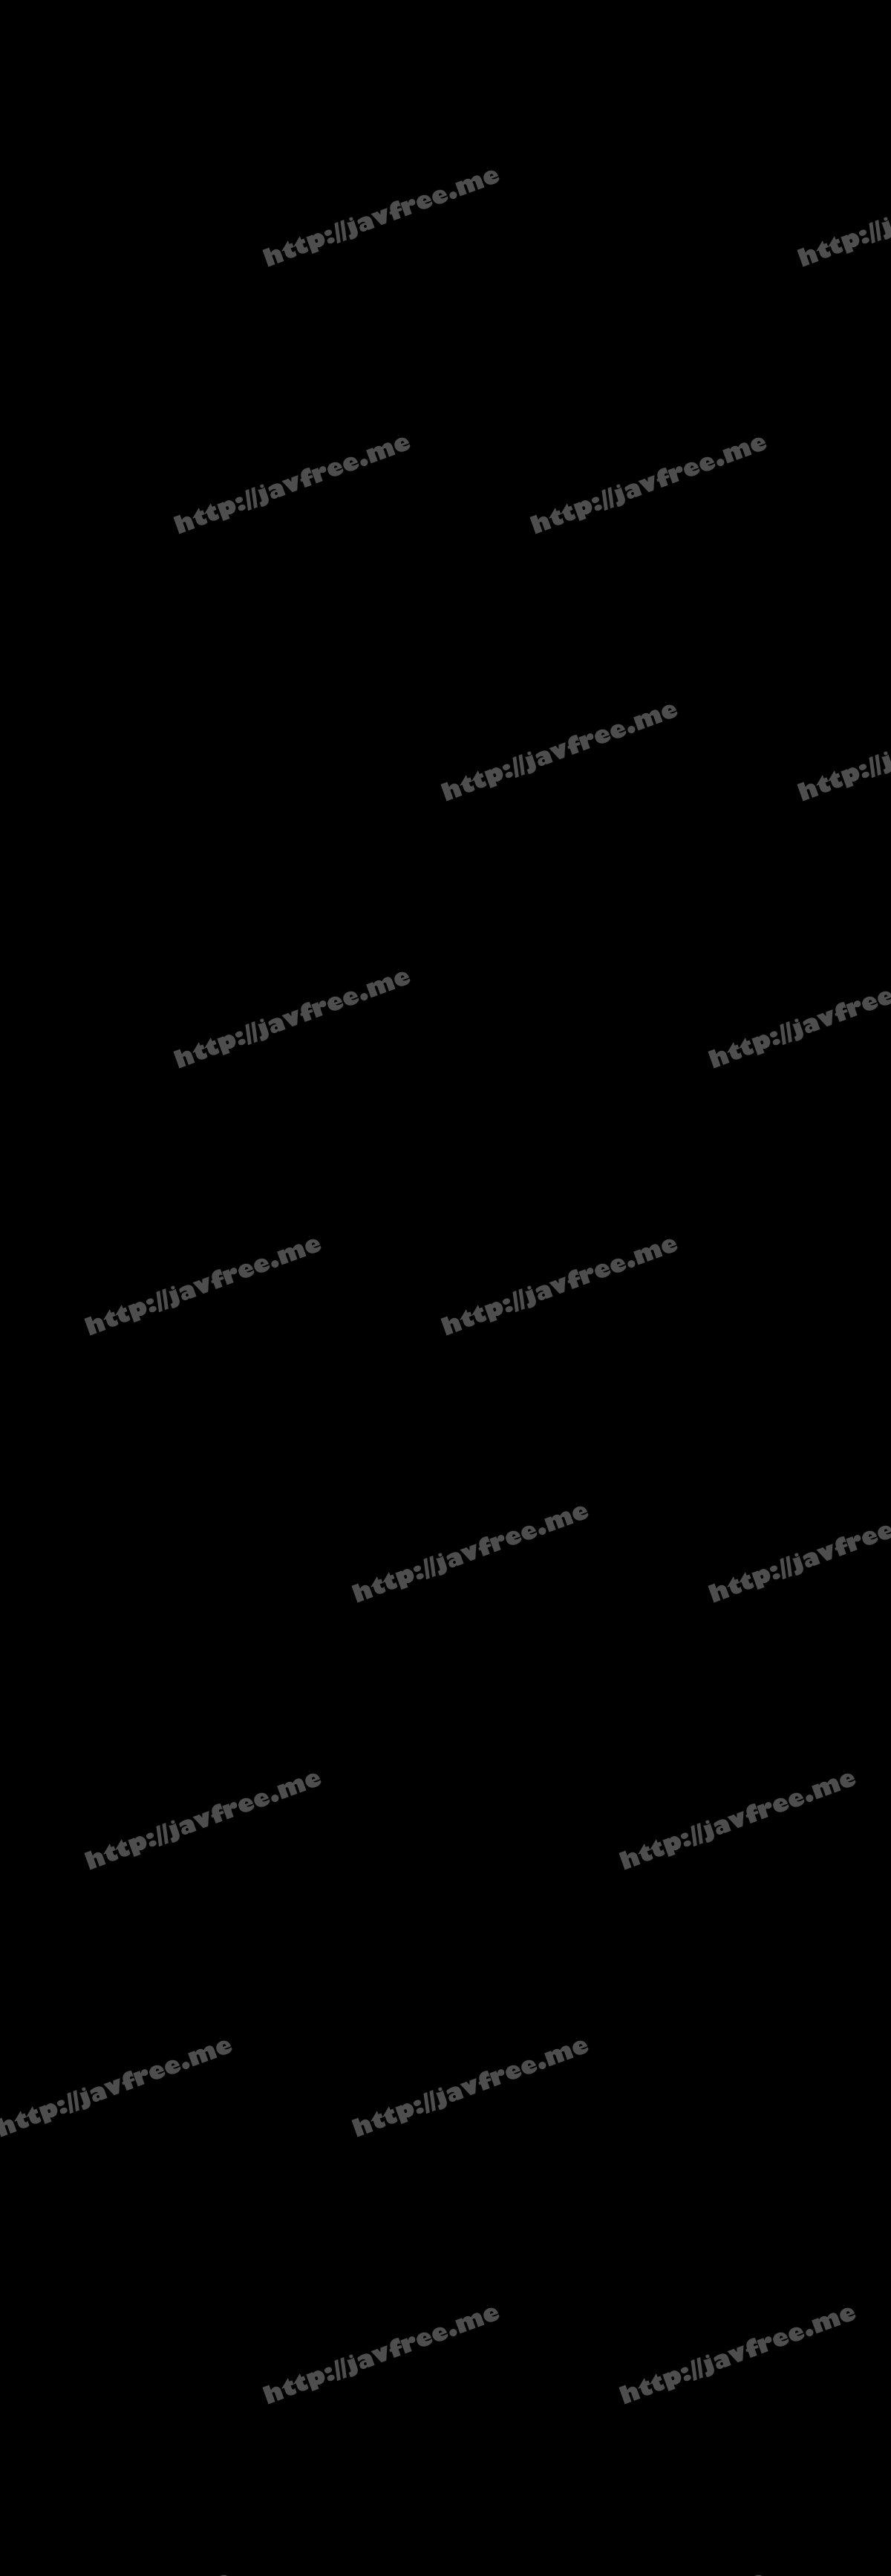 [HD][KNMD-033] 現代における奇譚な男女の物語 高宮菜々子 - image HUSR-186-720p on https://javfree.me